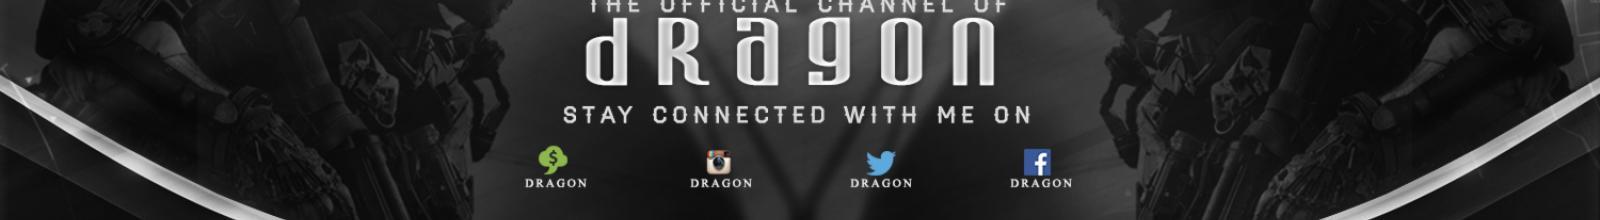 dragona